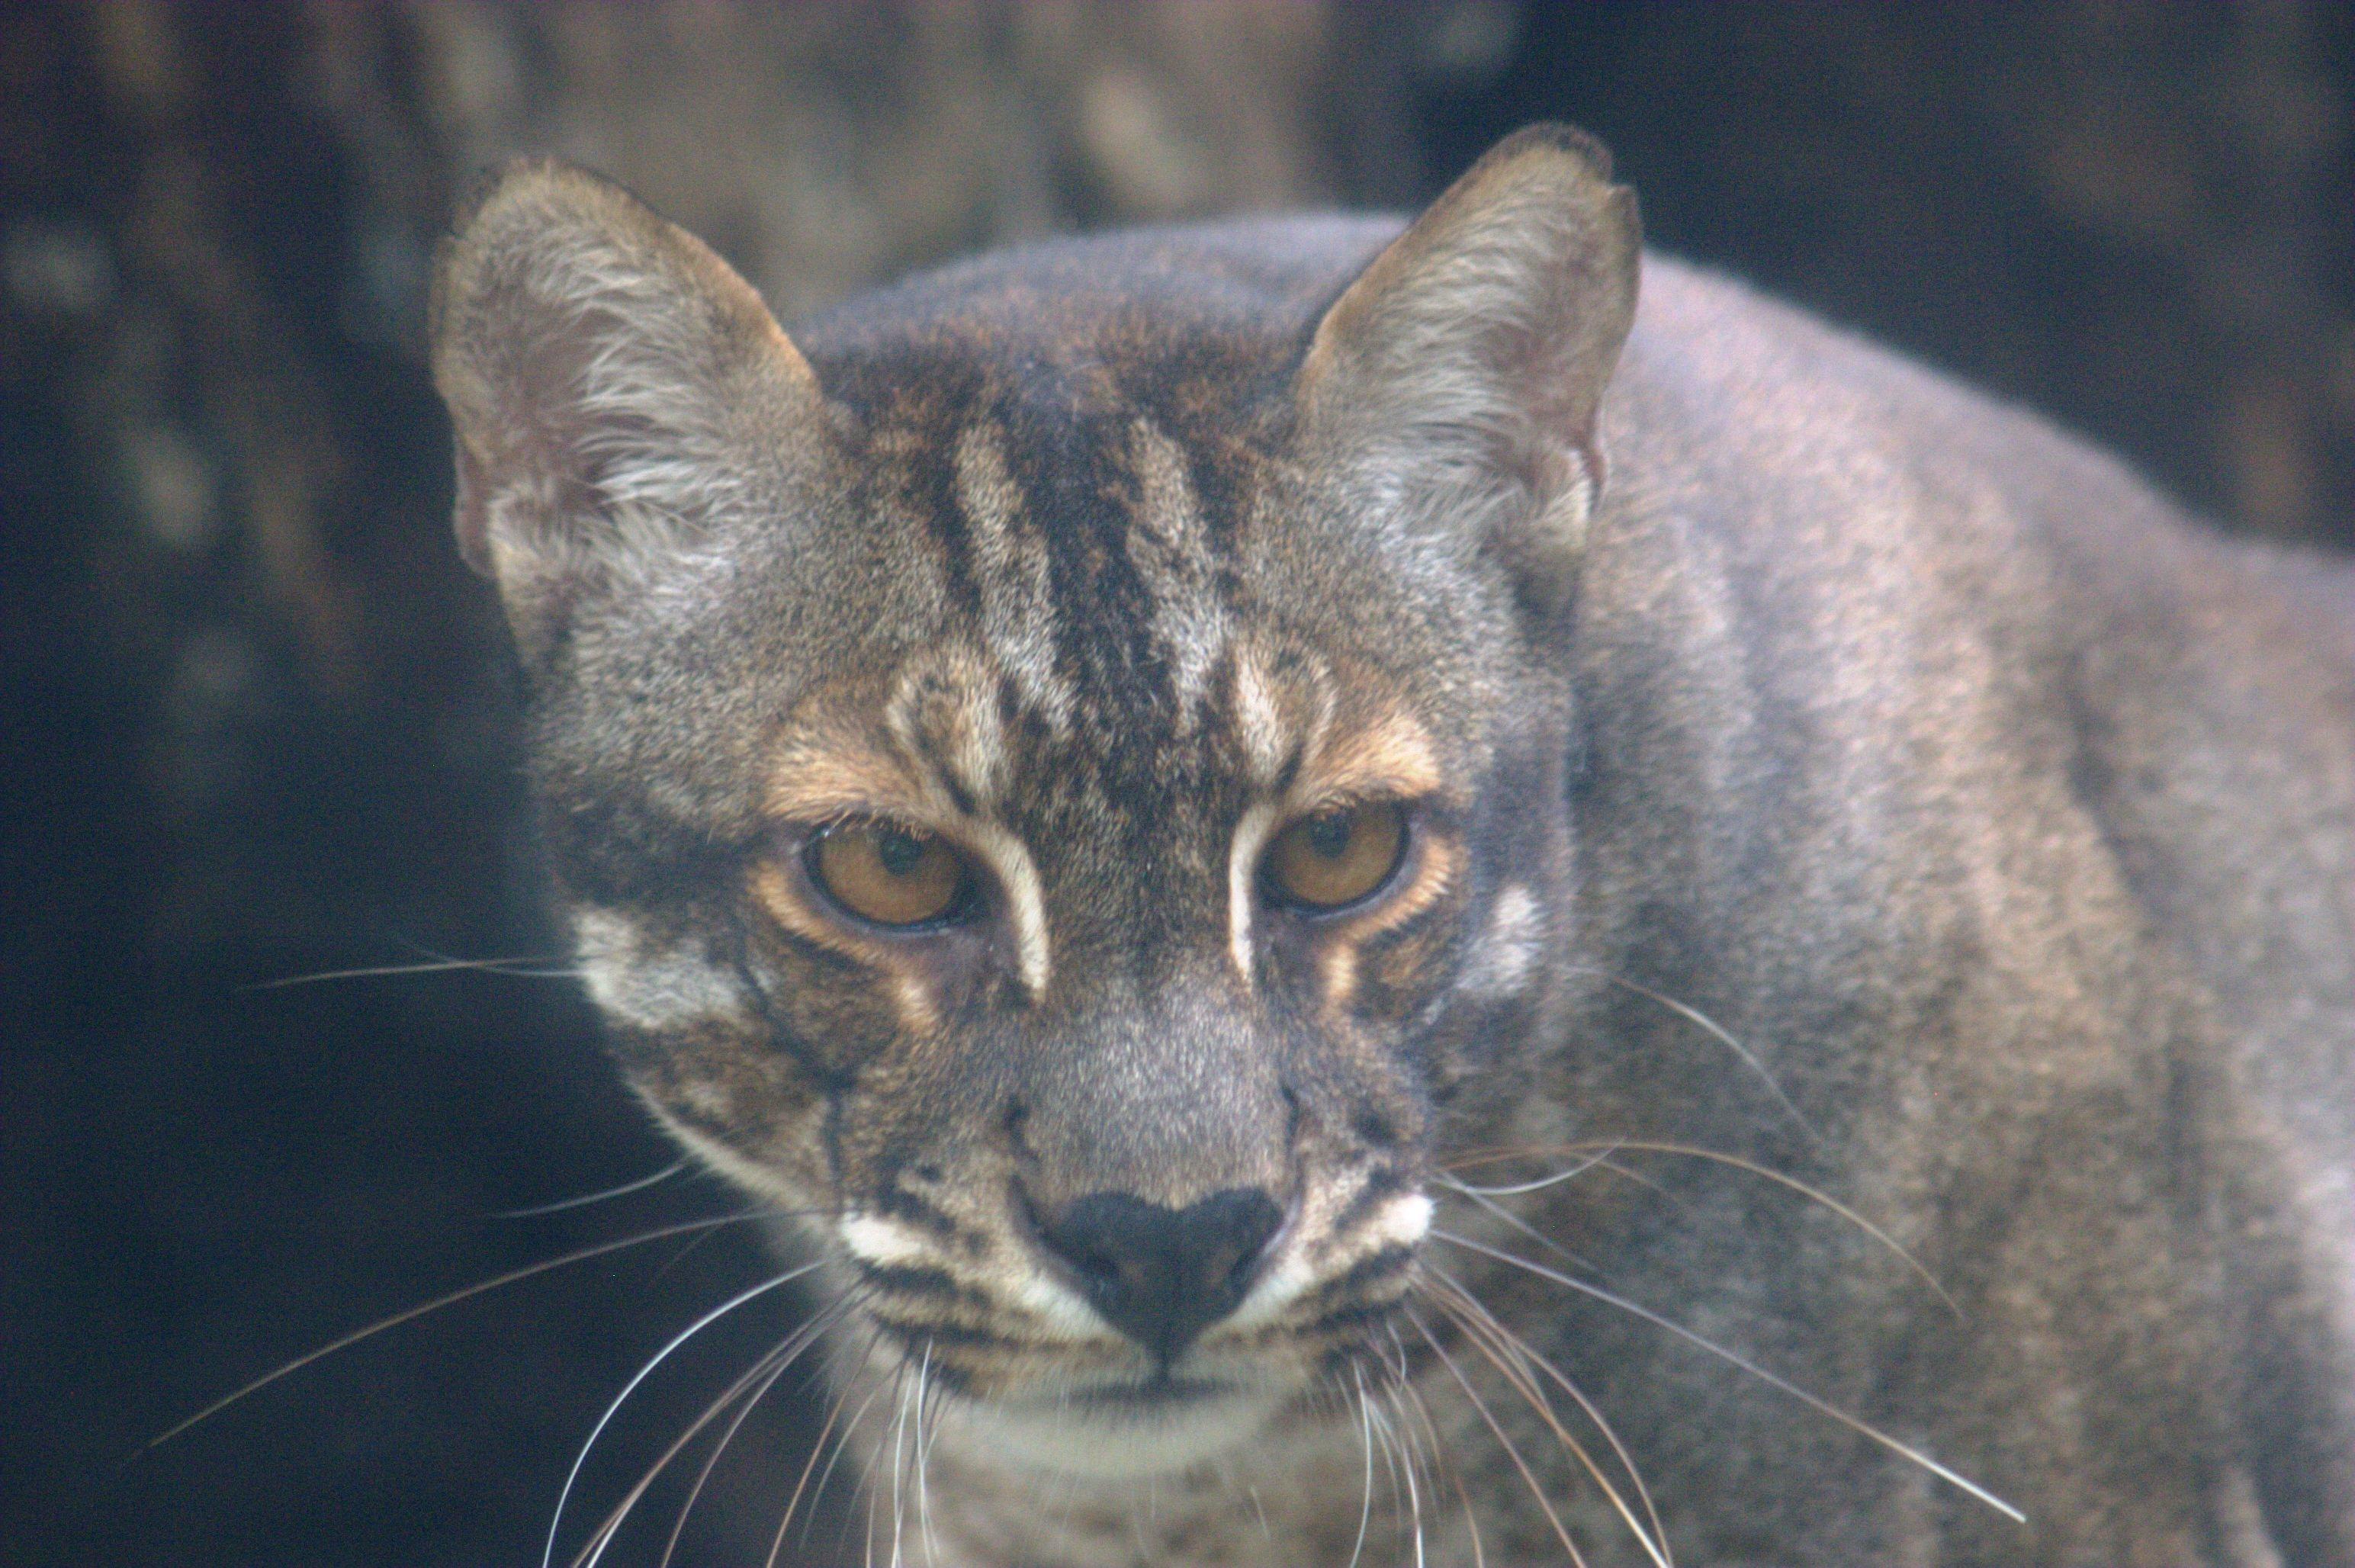 Image Pardofelis Temminckii Temminckii Southeast Asian Golden Cat Biolib Cz